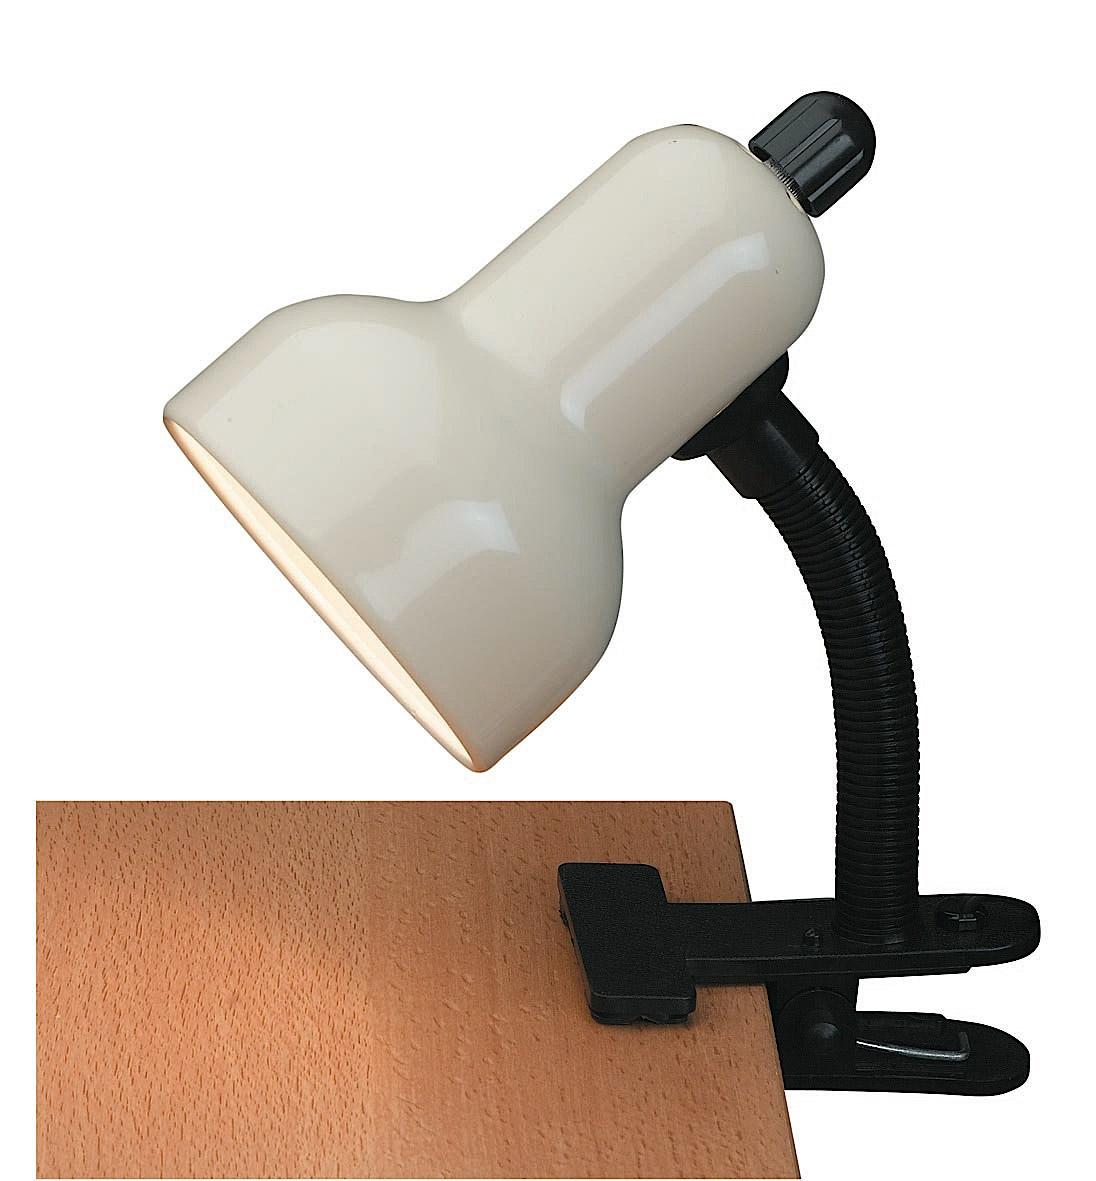 home lamps table lamps desk lamps lite source ls 111ivy. Black Bedroom Furniture Sets. Home Design Ideas